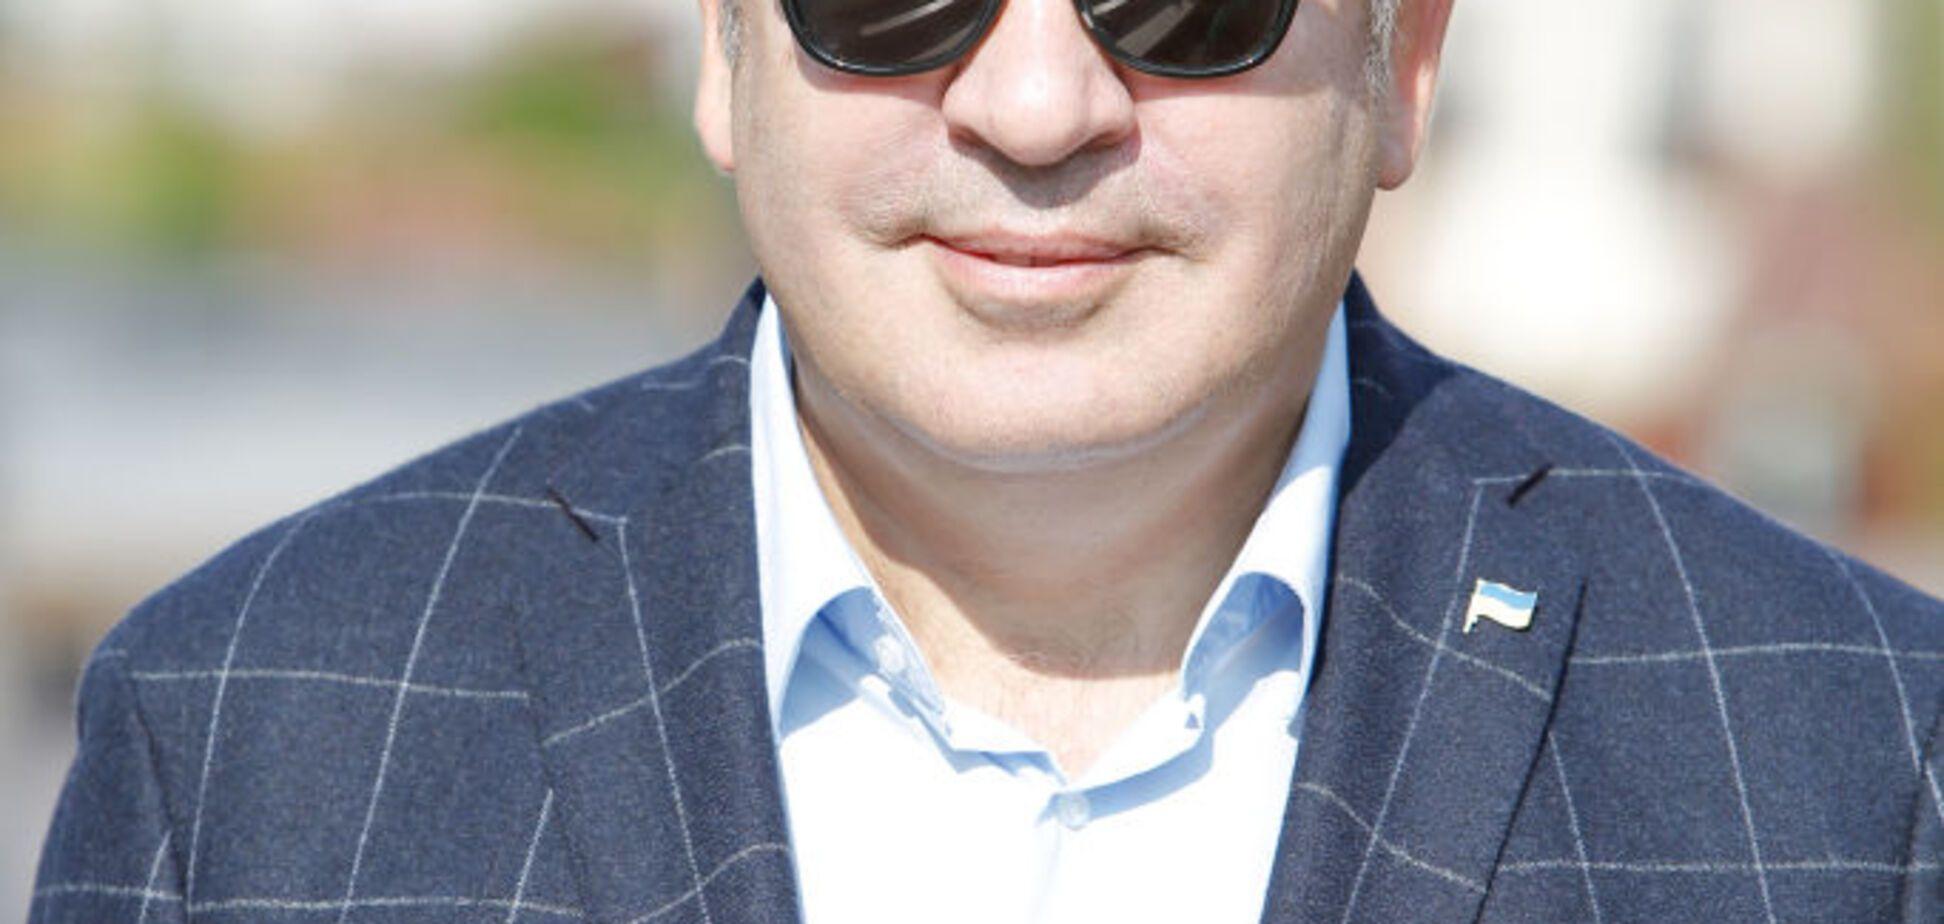 'Денег хватит': стало известно, сколько Саакашвили платит за проживание во Львове